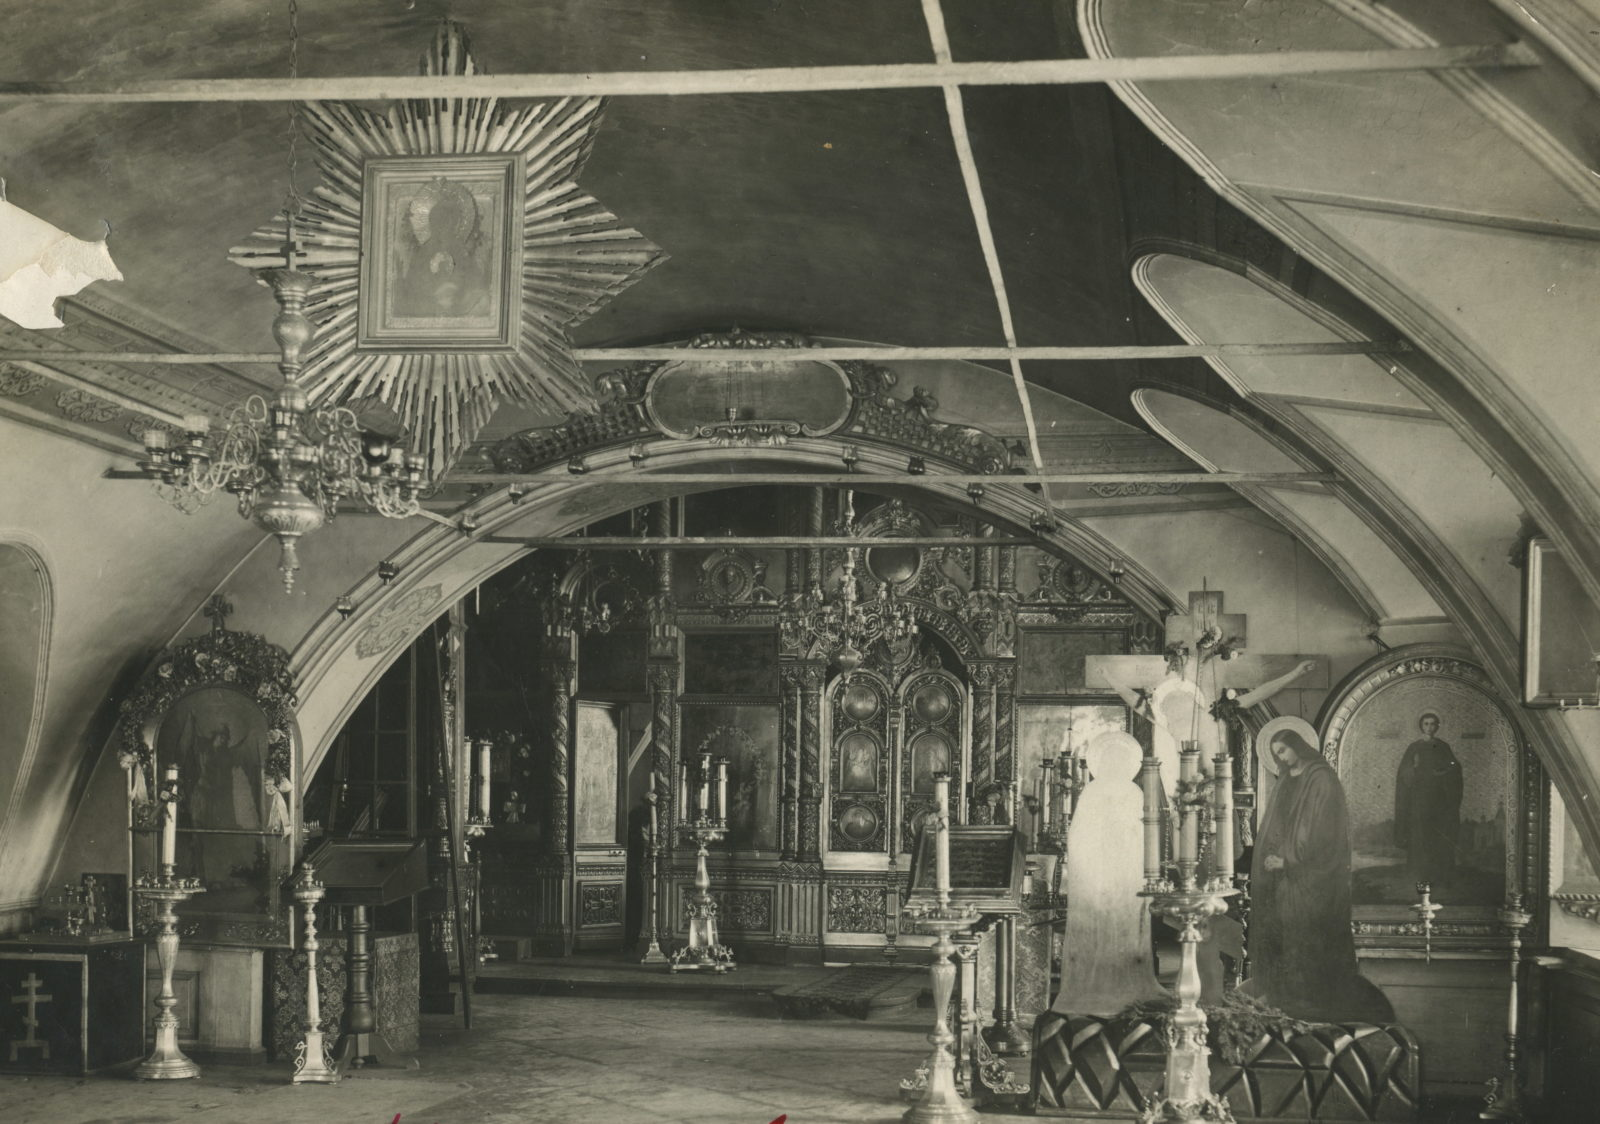 Nicholay-Mozhaisk church. Interior. Murom, Vladimir Province, Russia